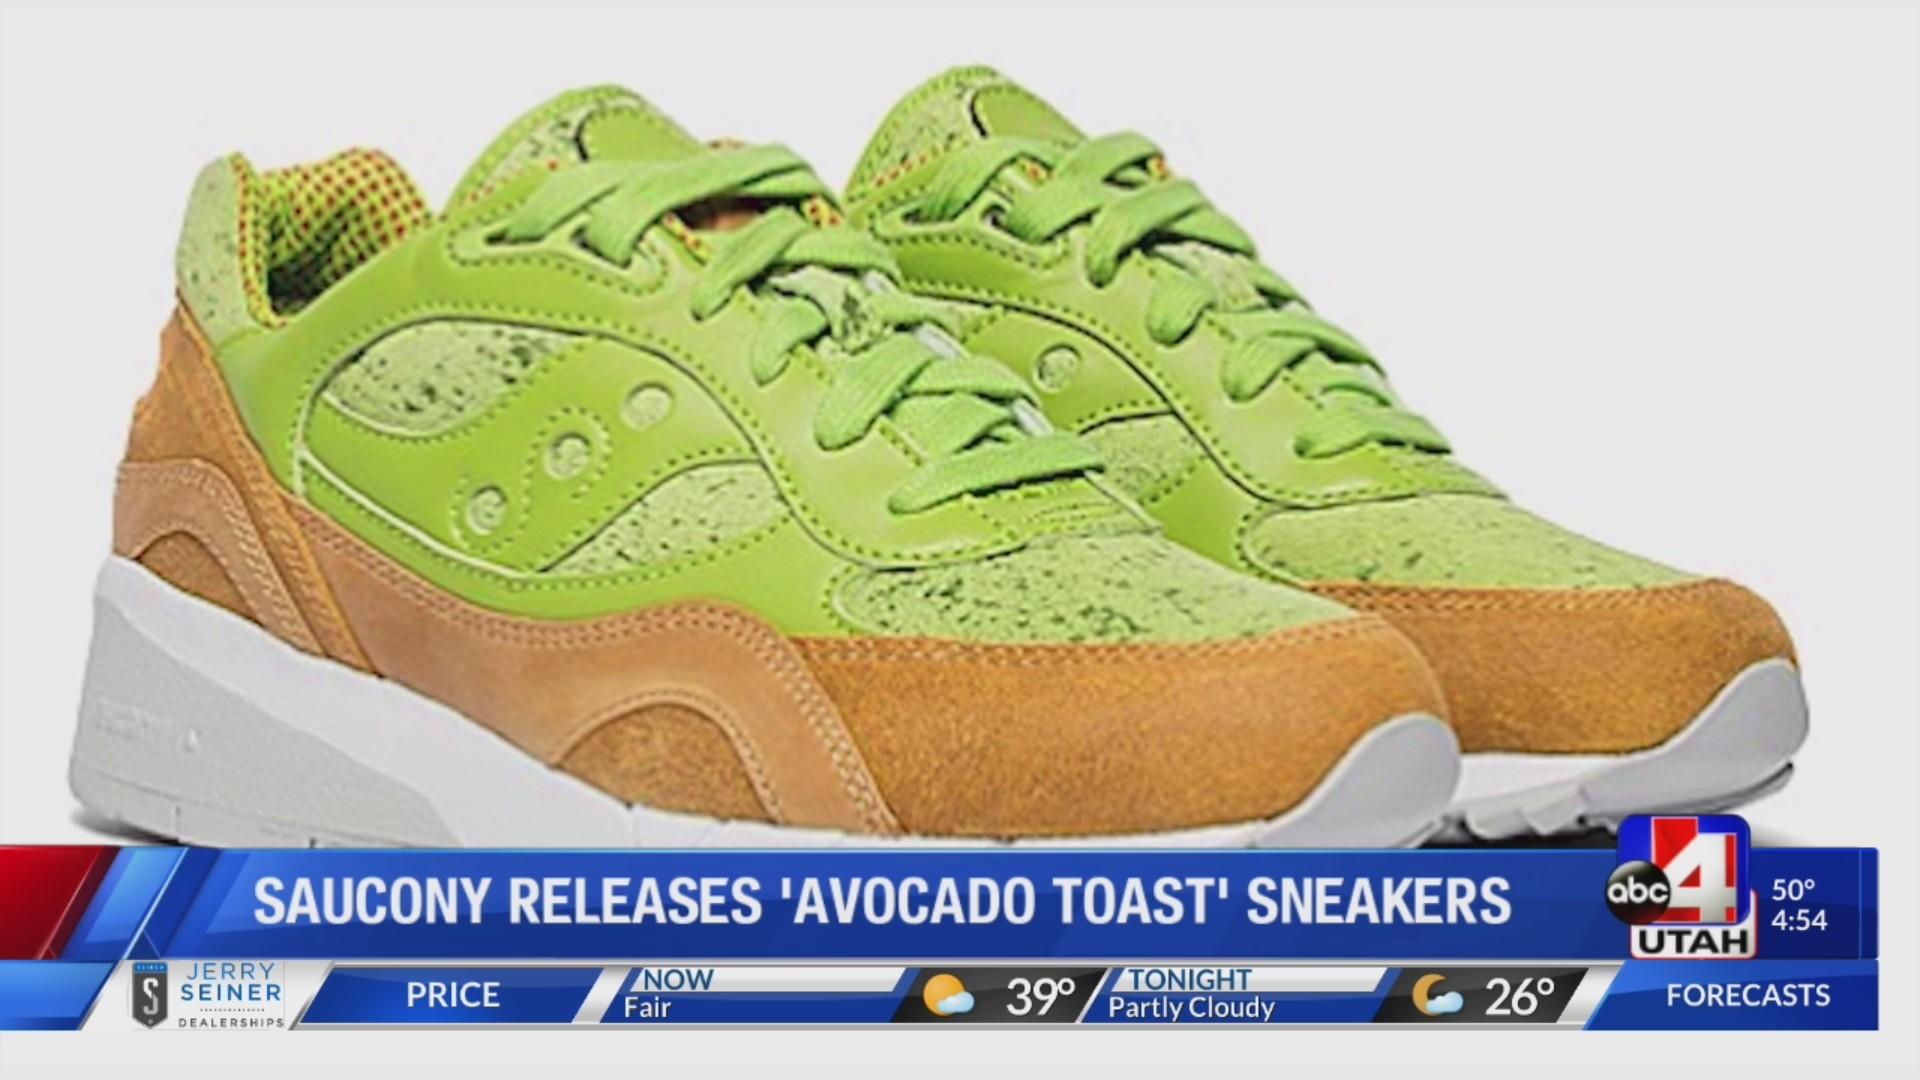 Saucony releases avocado toast inspired